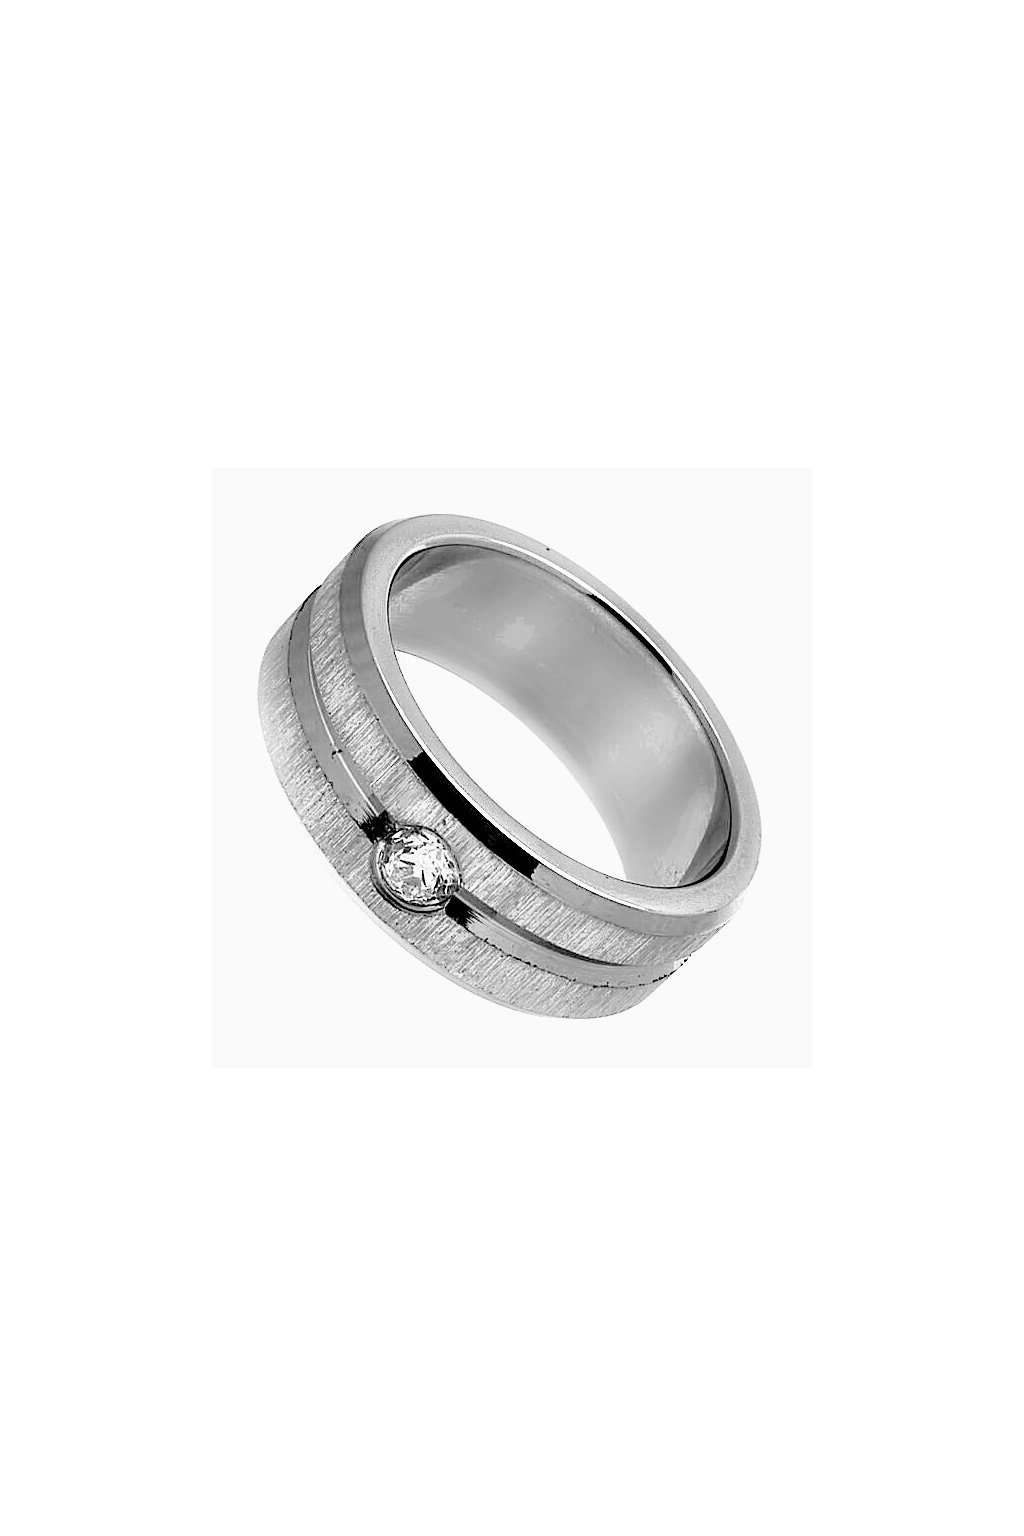 Skalimar Prsten z chirurgické oceli S MATNÝM BRUSEM A DROBNÝM ZIKRONEM 212117